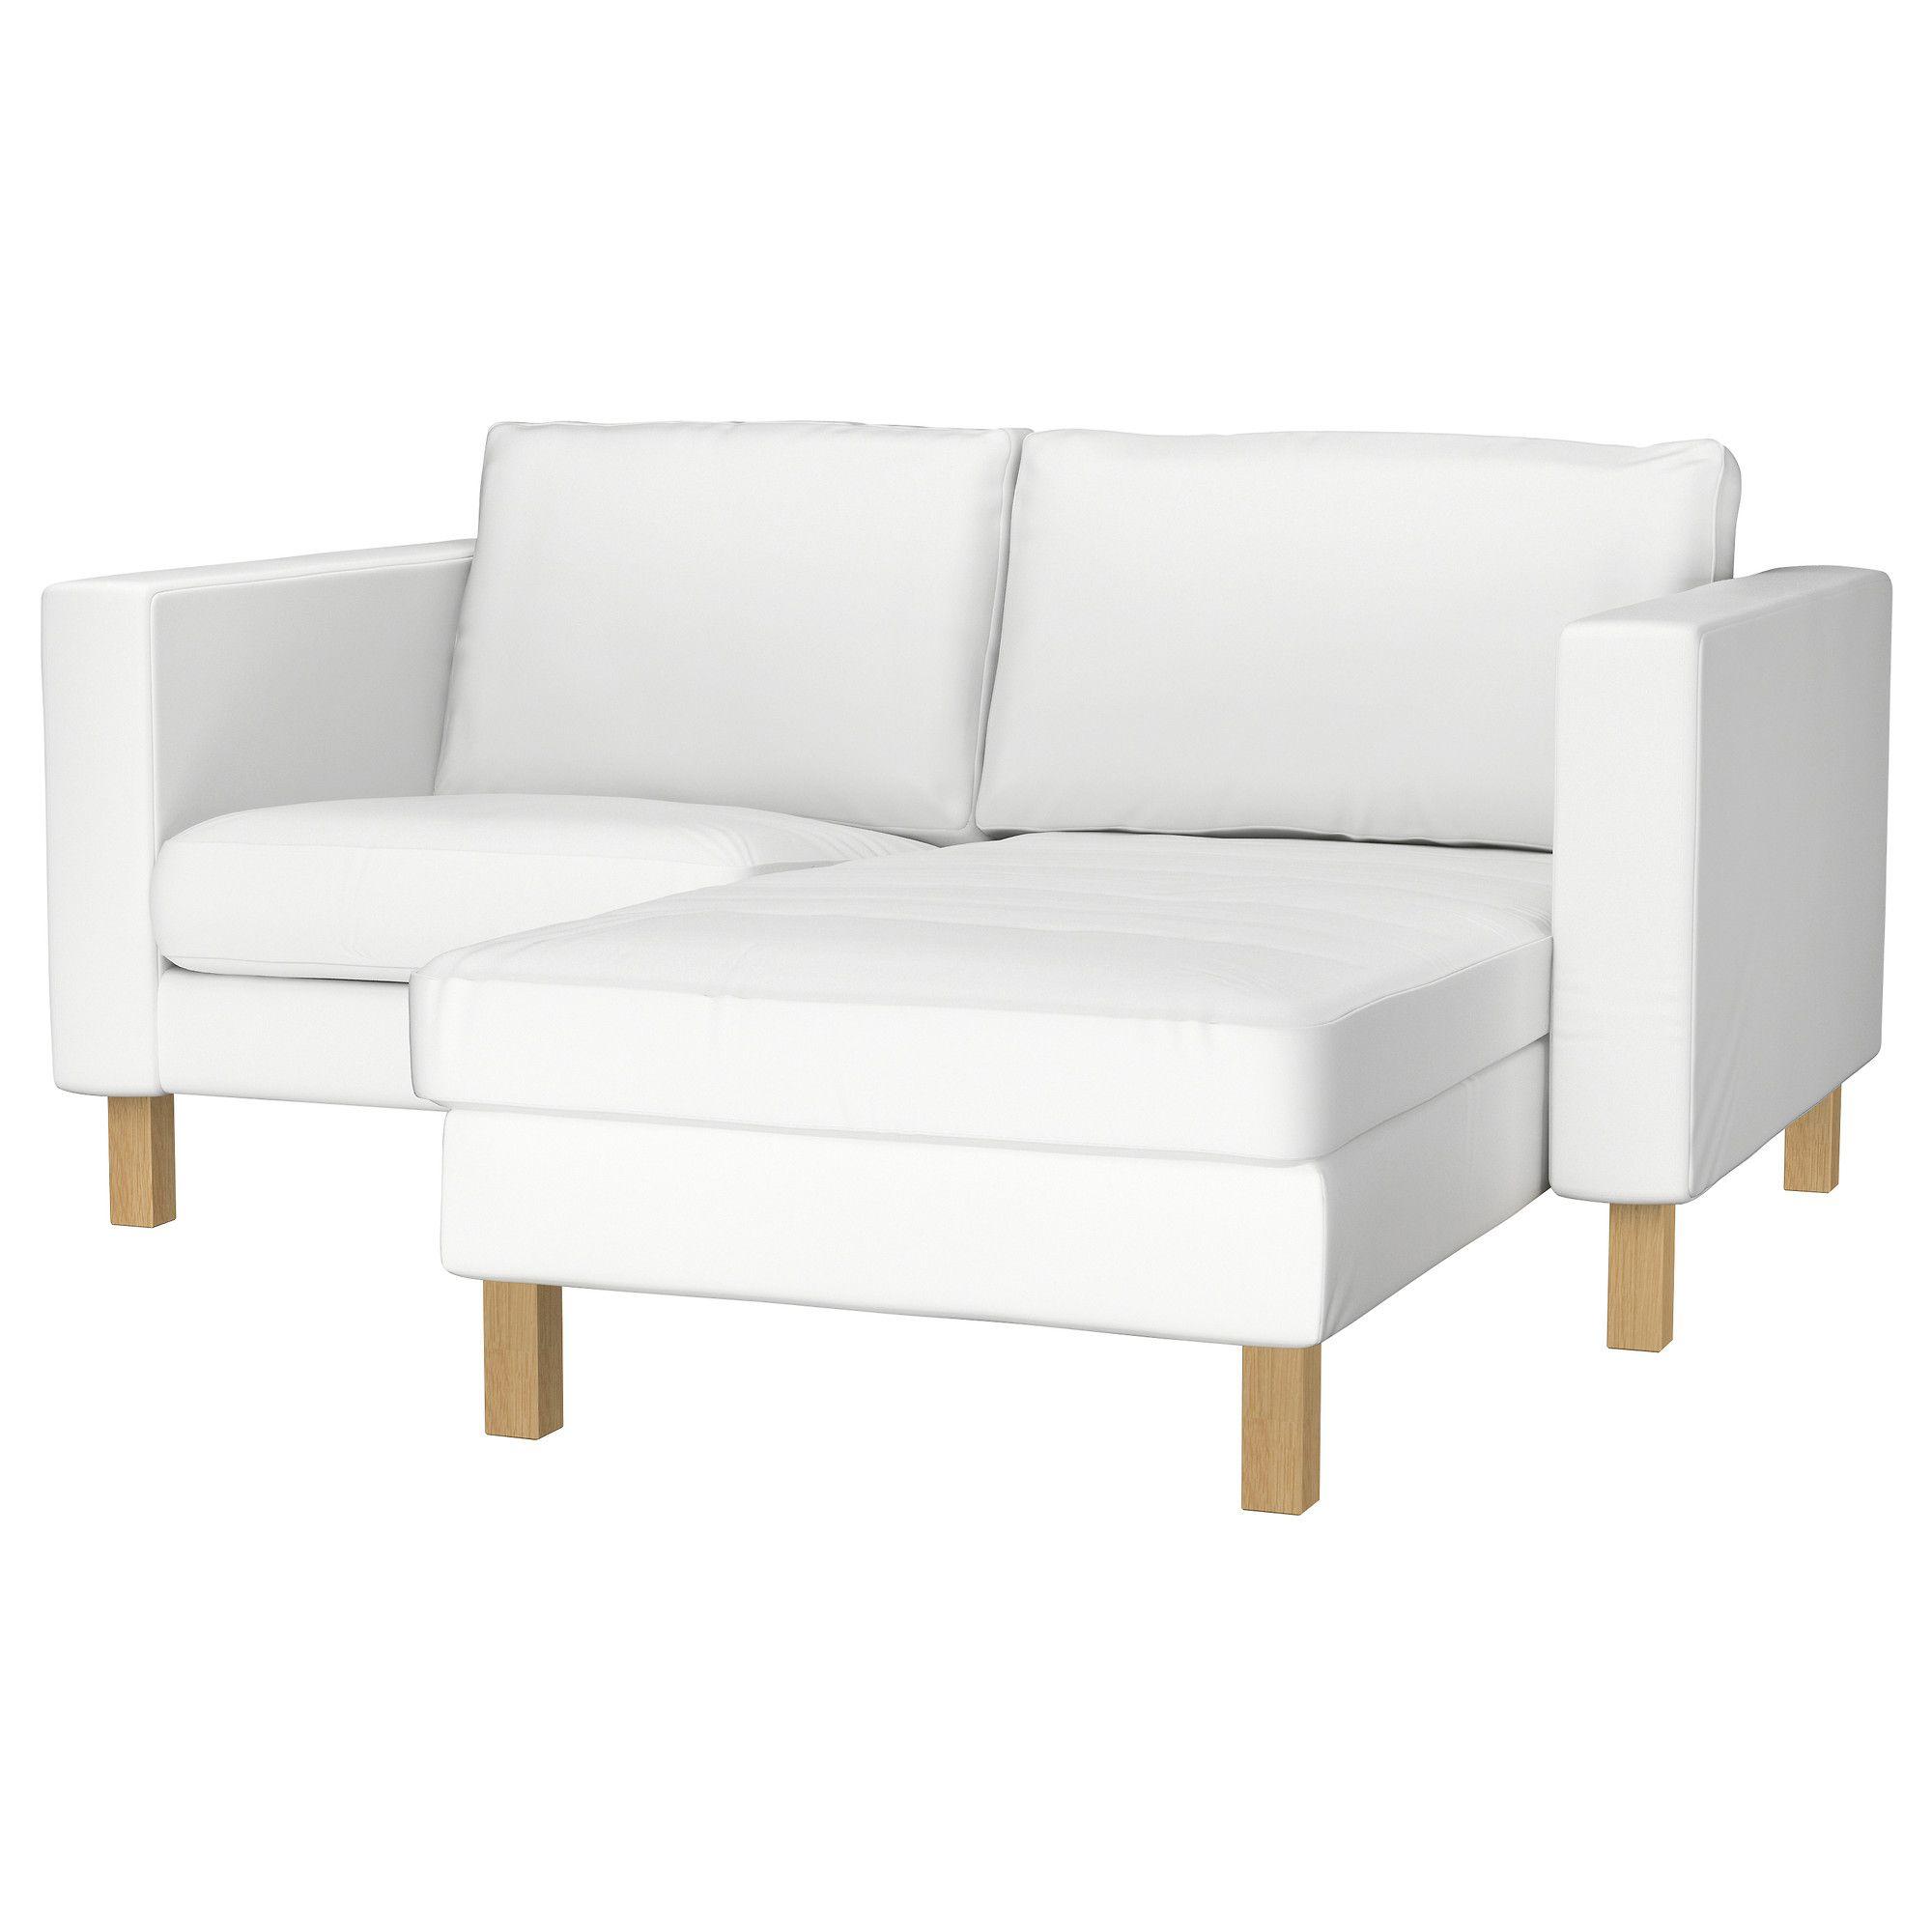 karlstad sofa blekinge white black corner cheap armchair and chaise lounge